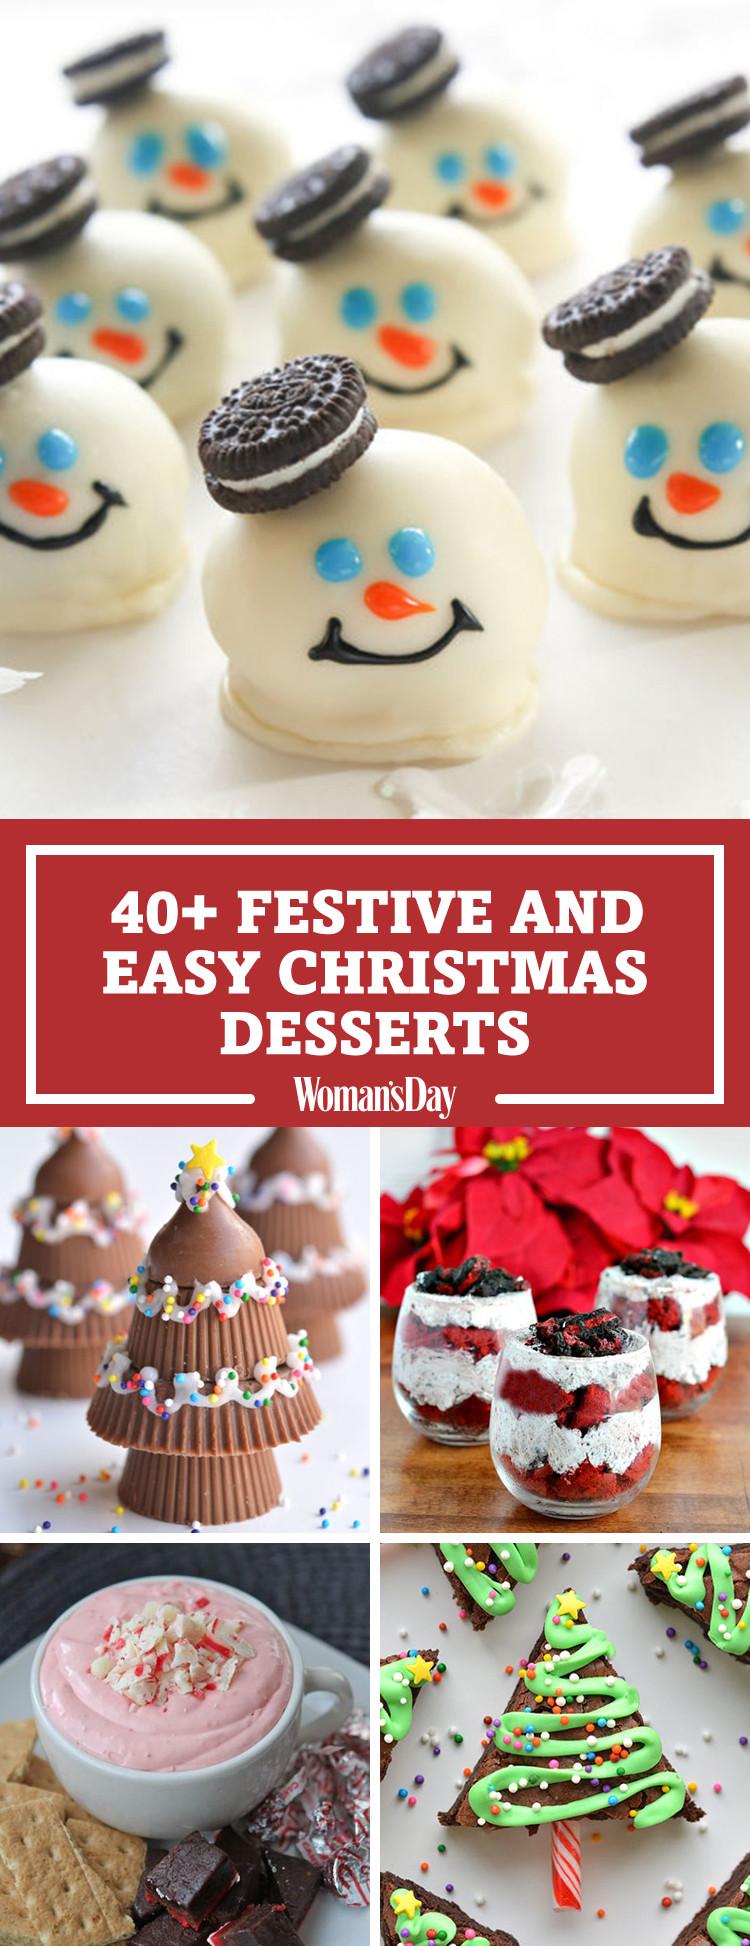 Homemade Christmas Desserts  57 Easy Christmas Dessert Recipes Best Ideas for Fun